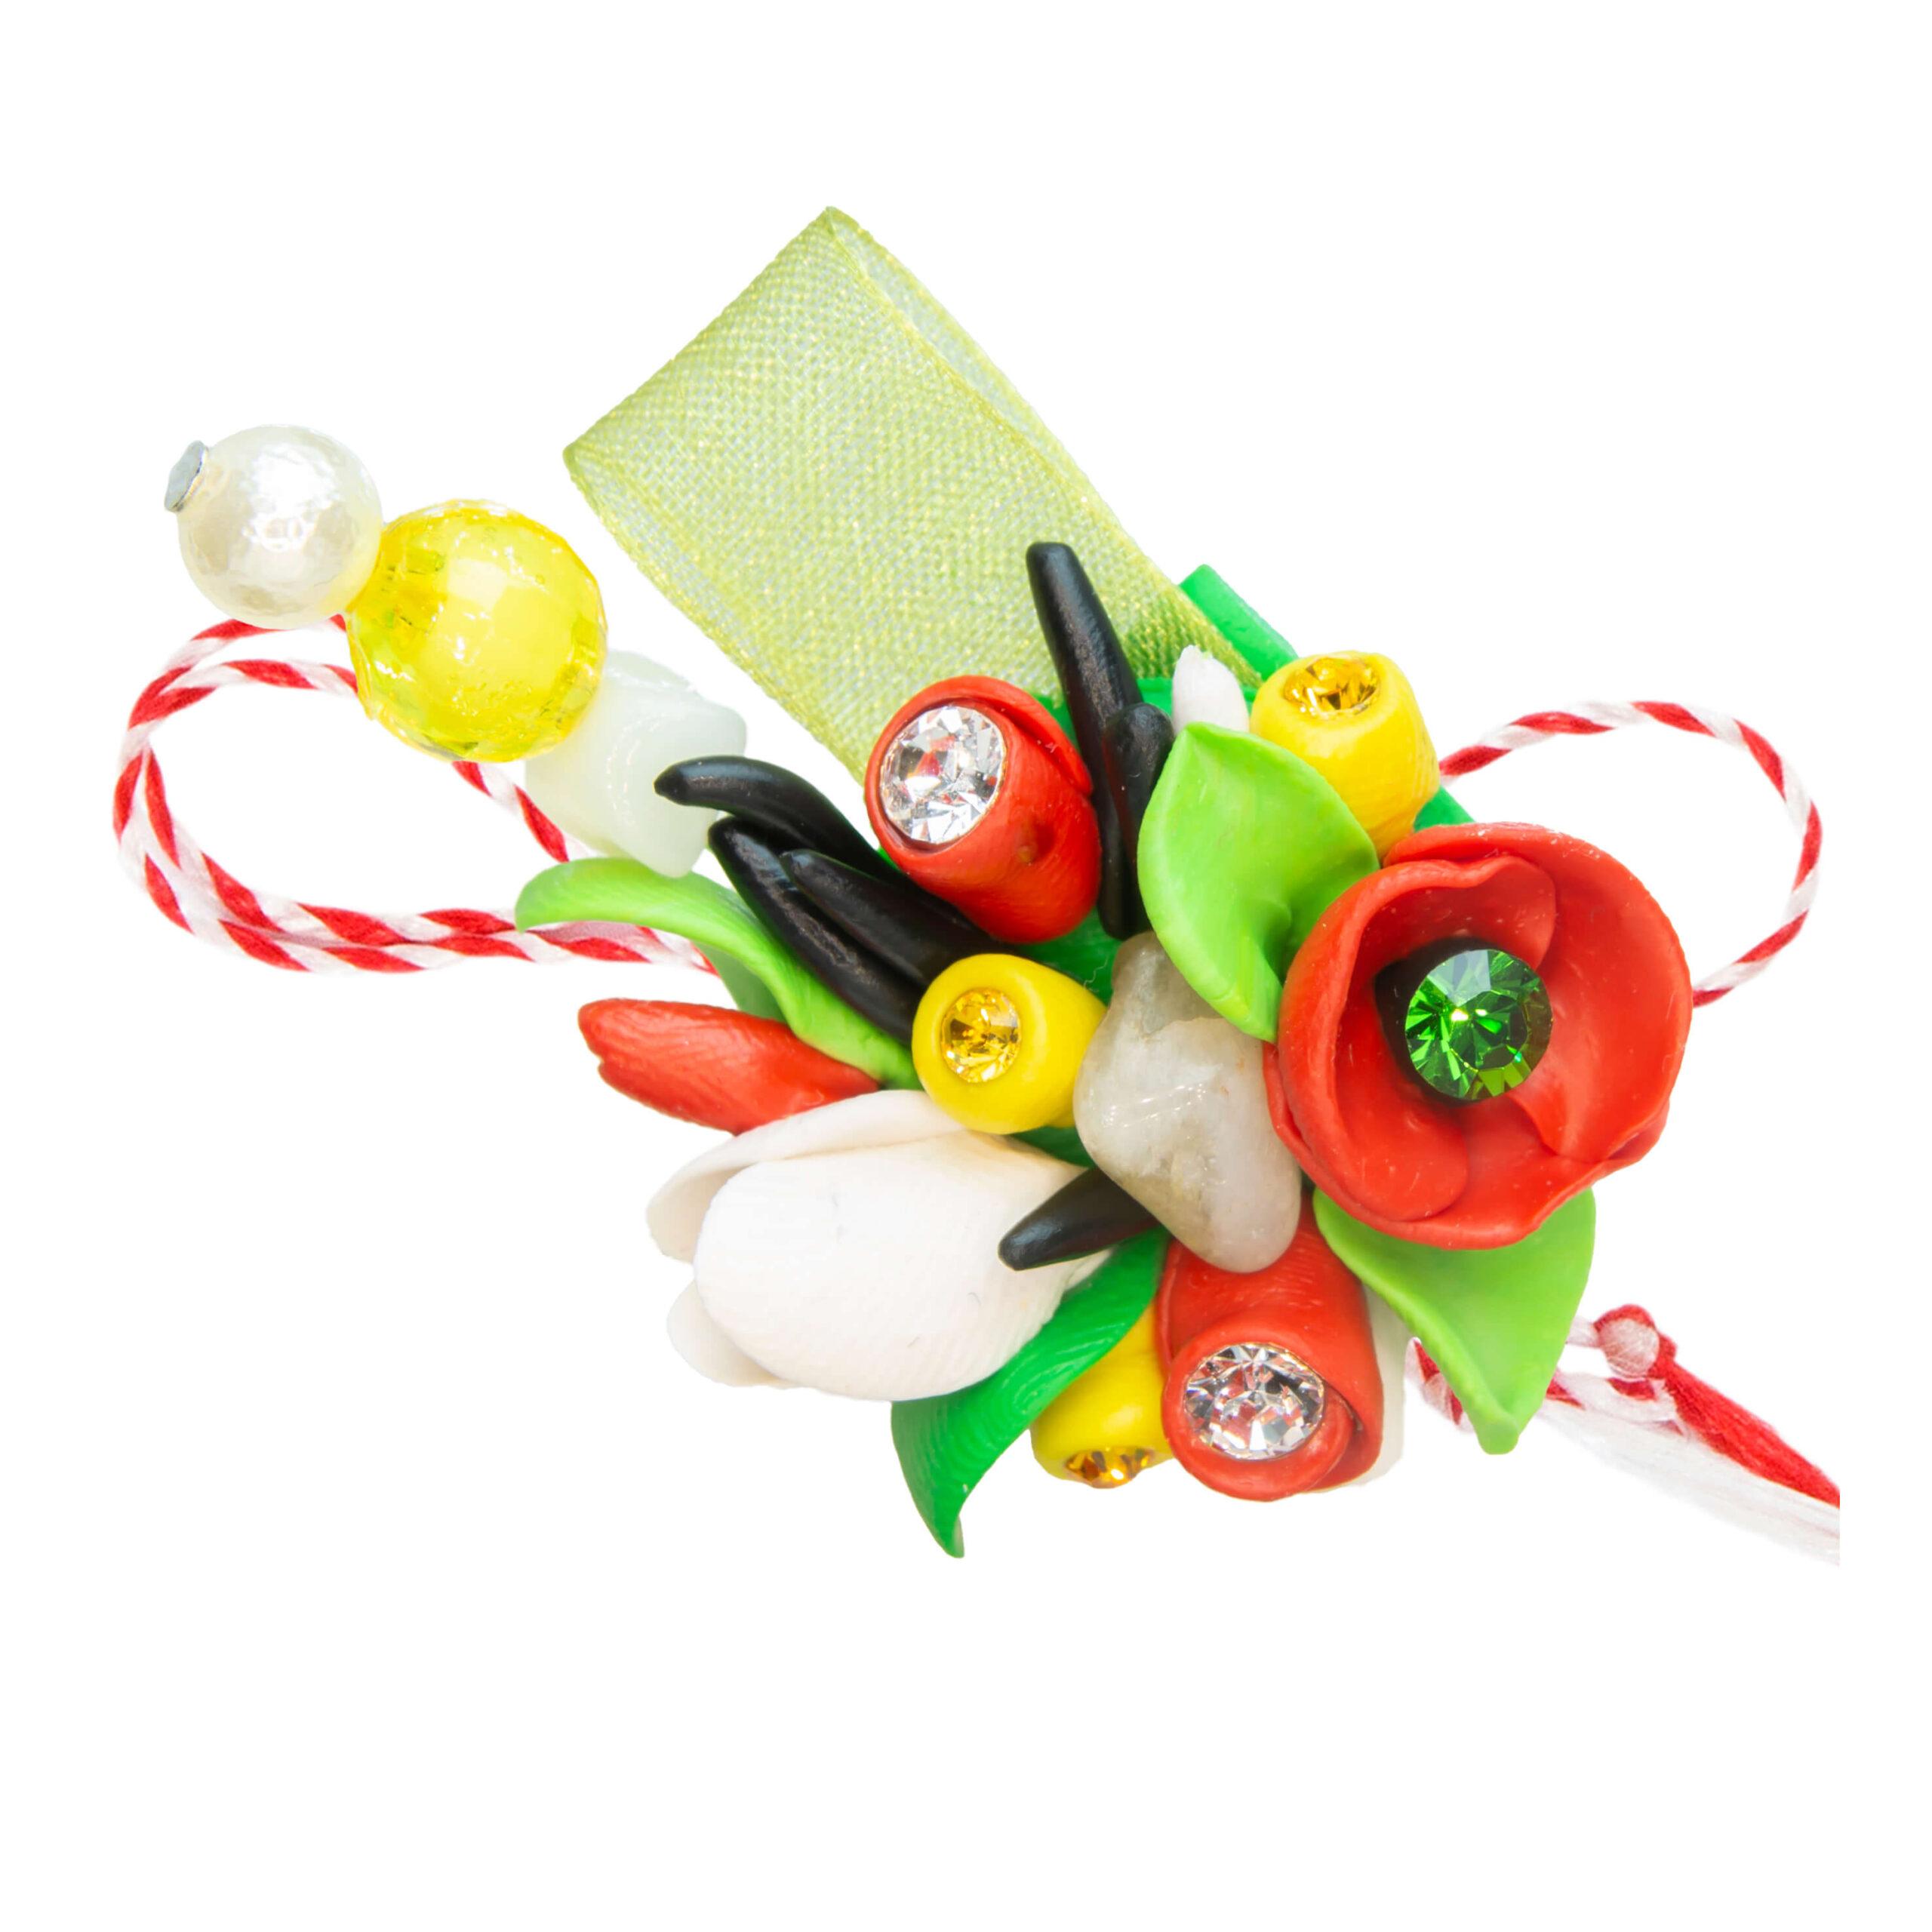 Martisor brosa buchet flori, Miidefloriart, model 61